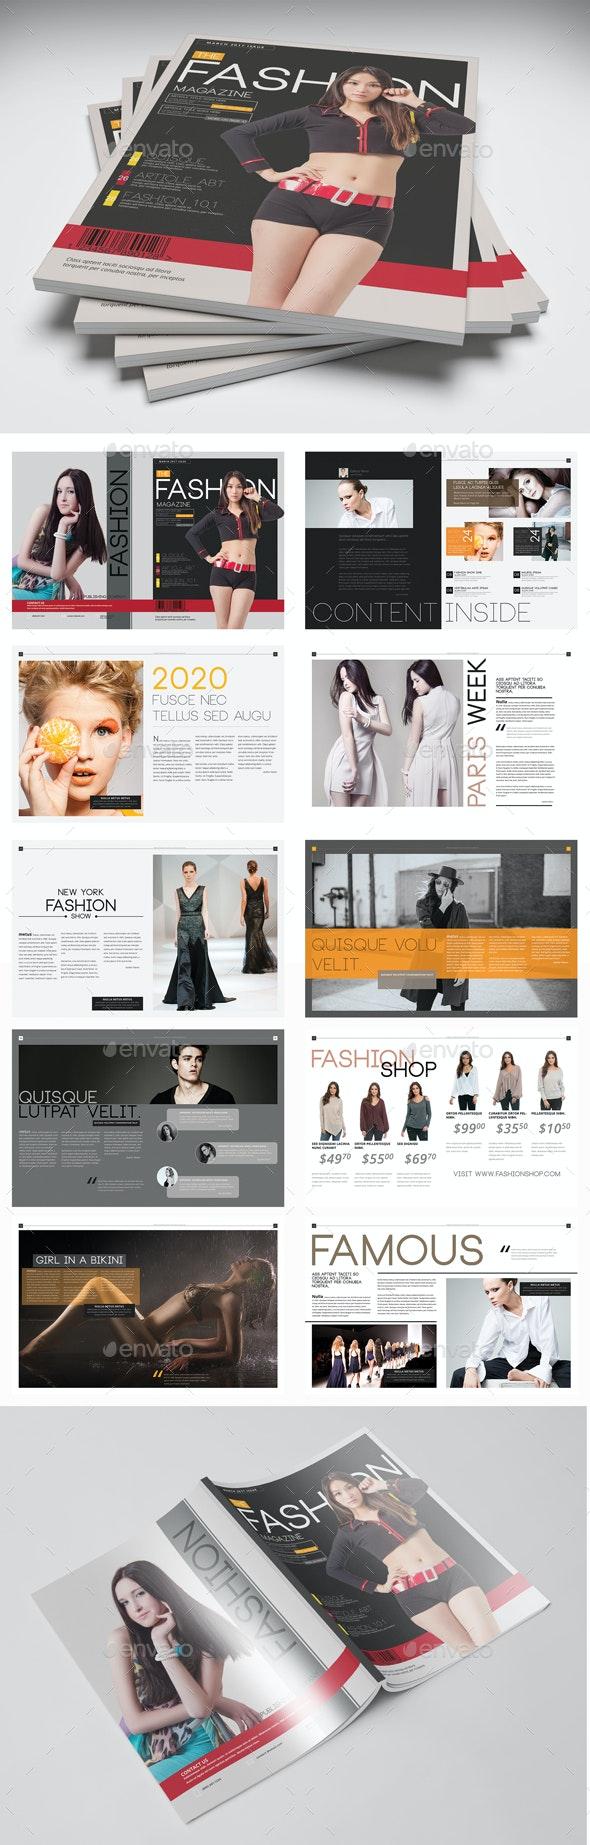 Fashion Magazine Template - PSD - Magazines Print Templates